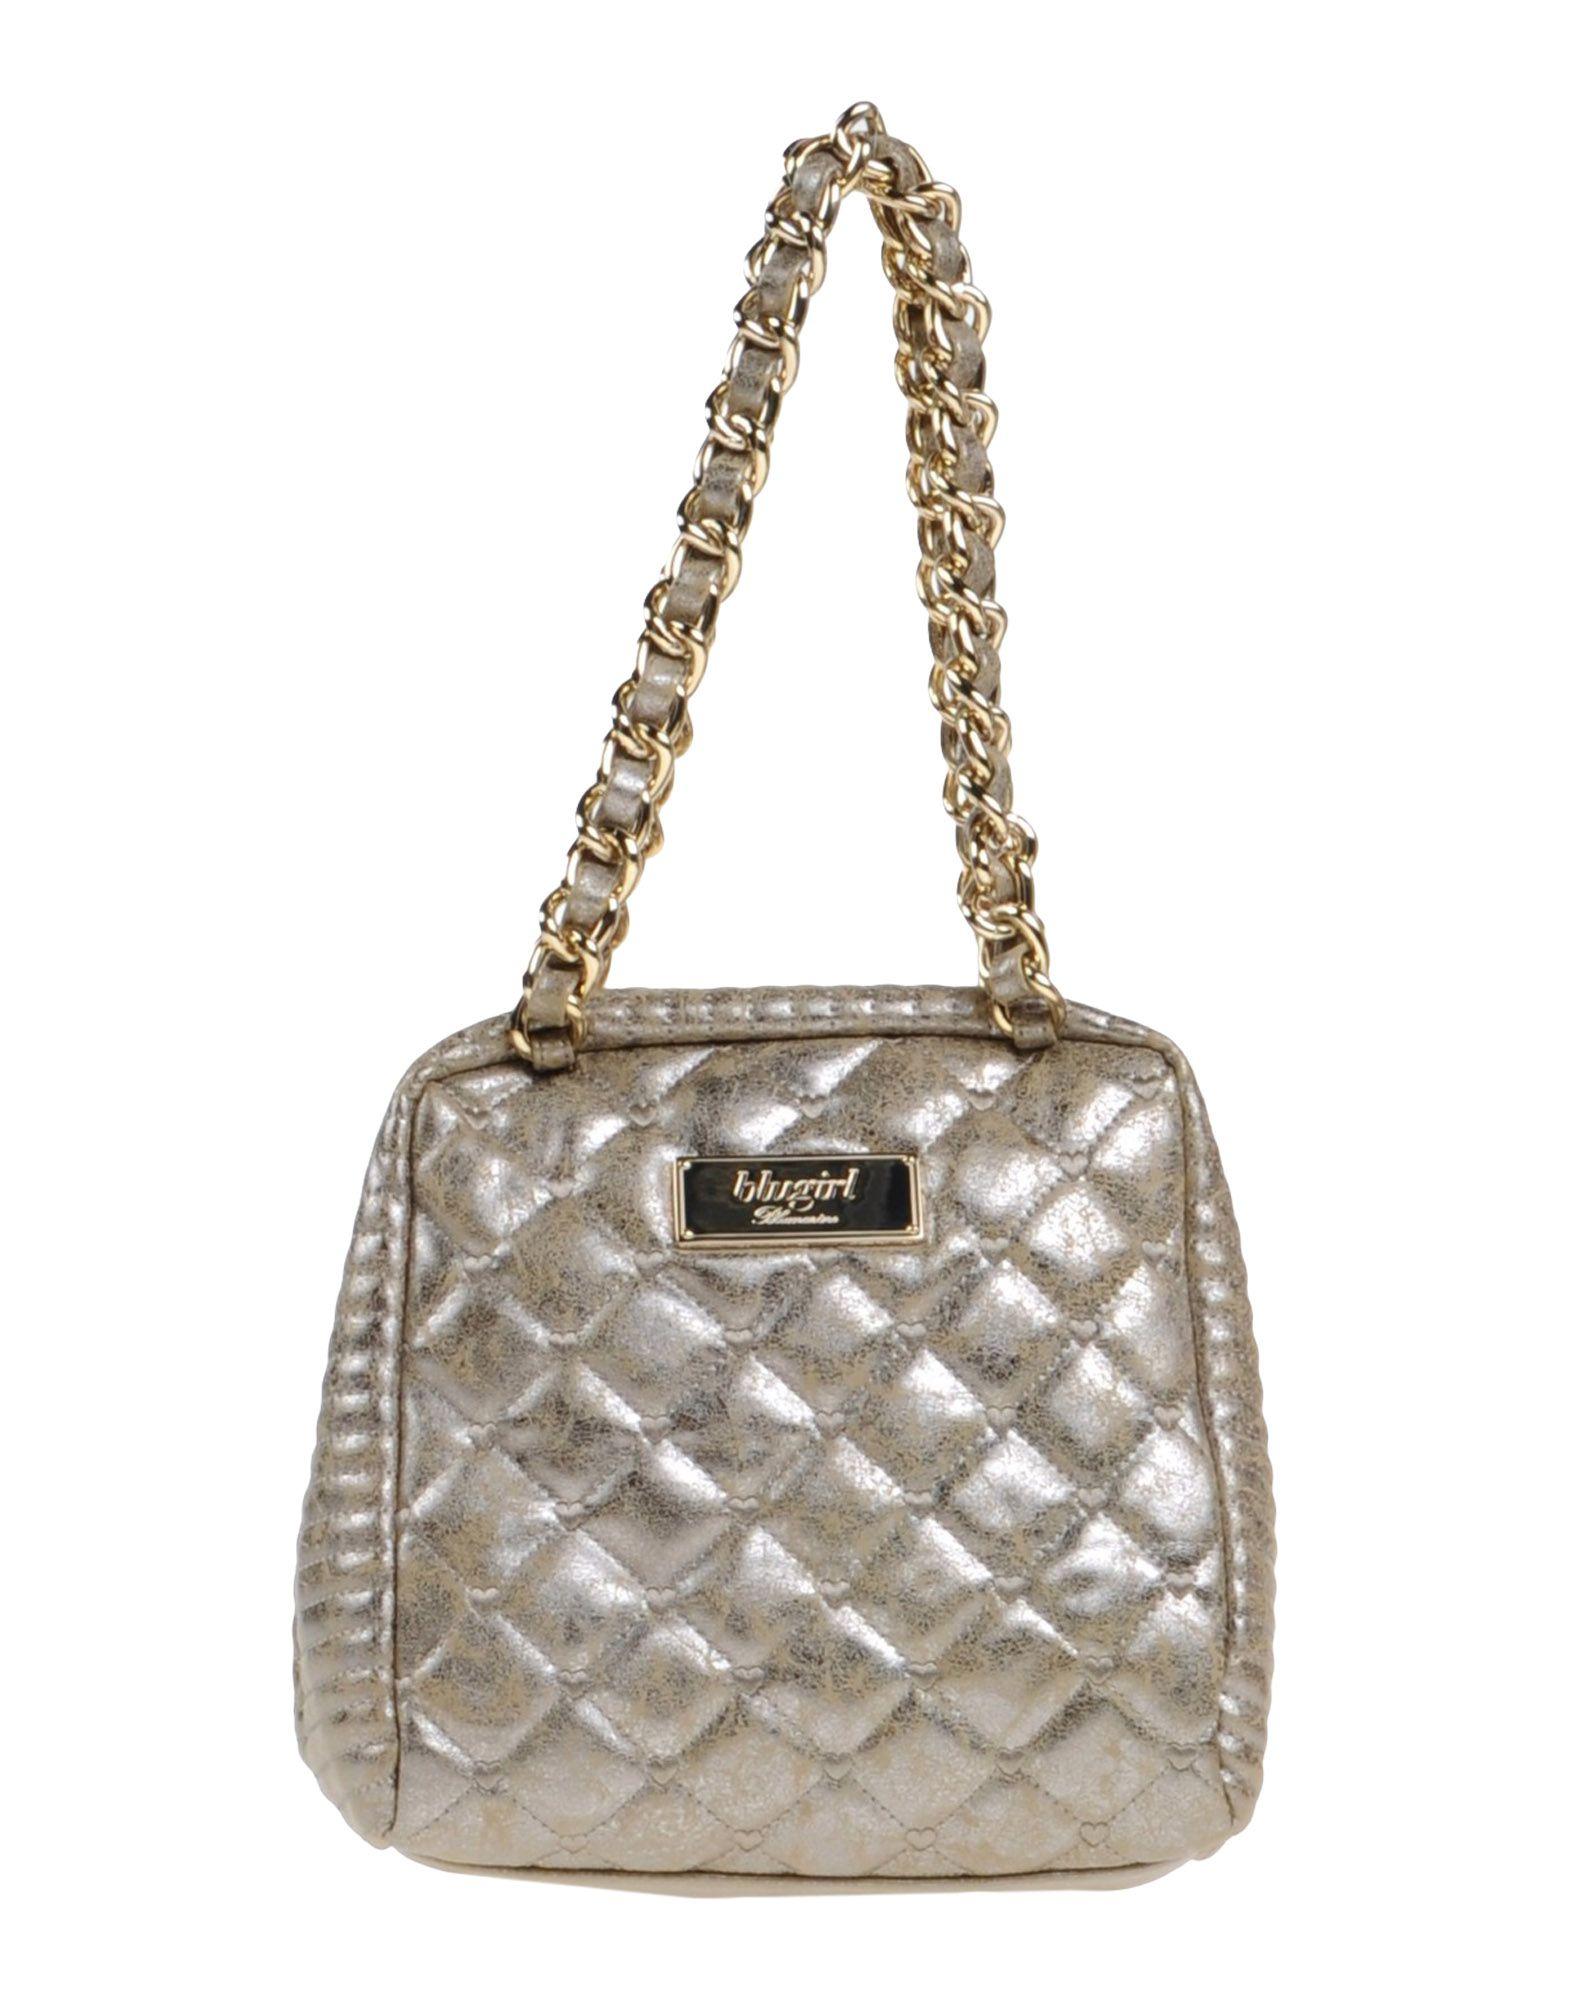 Blugirl blumarine Handbag in Gold